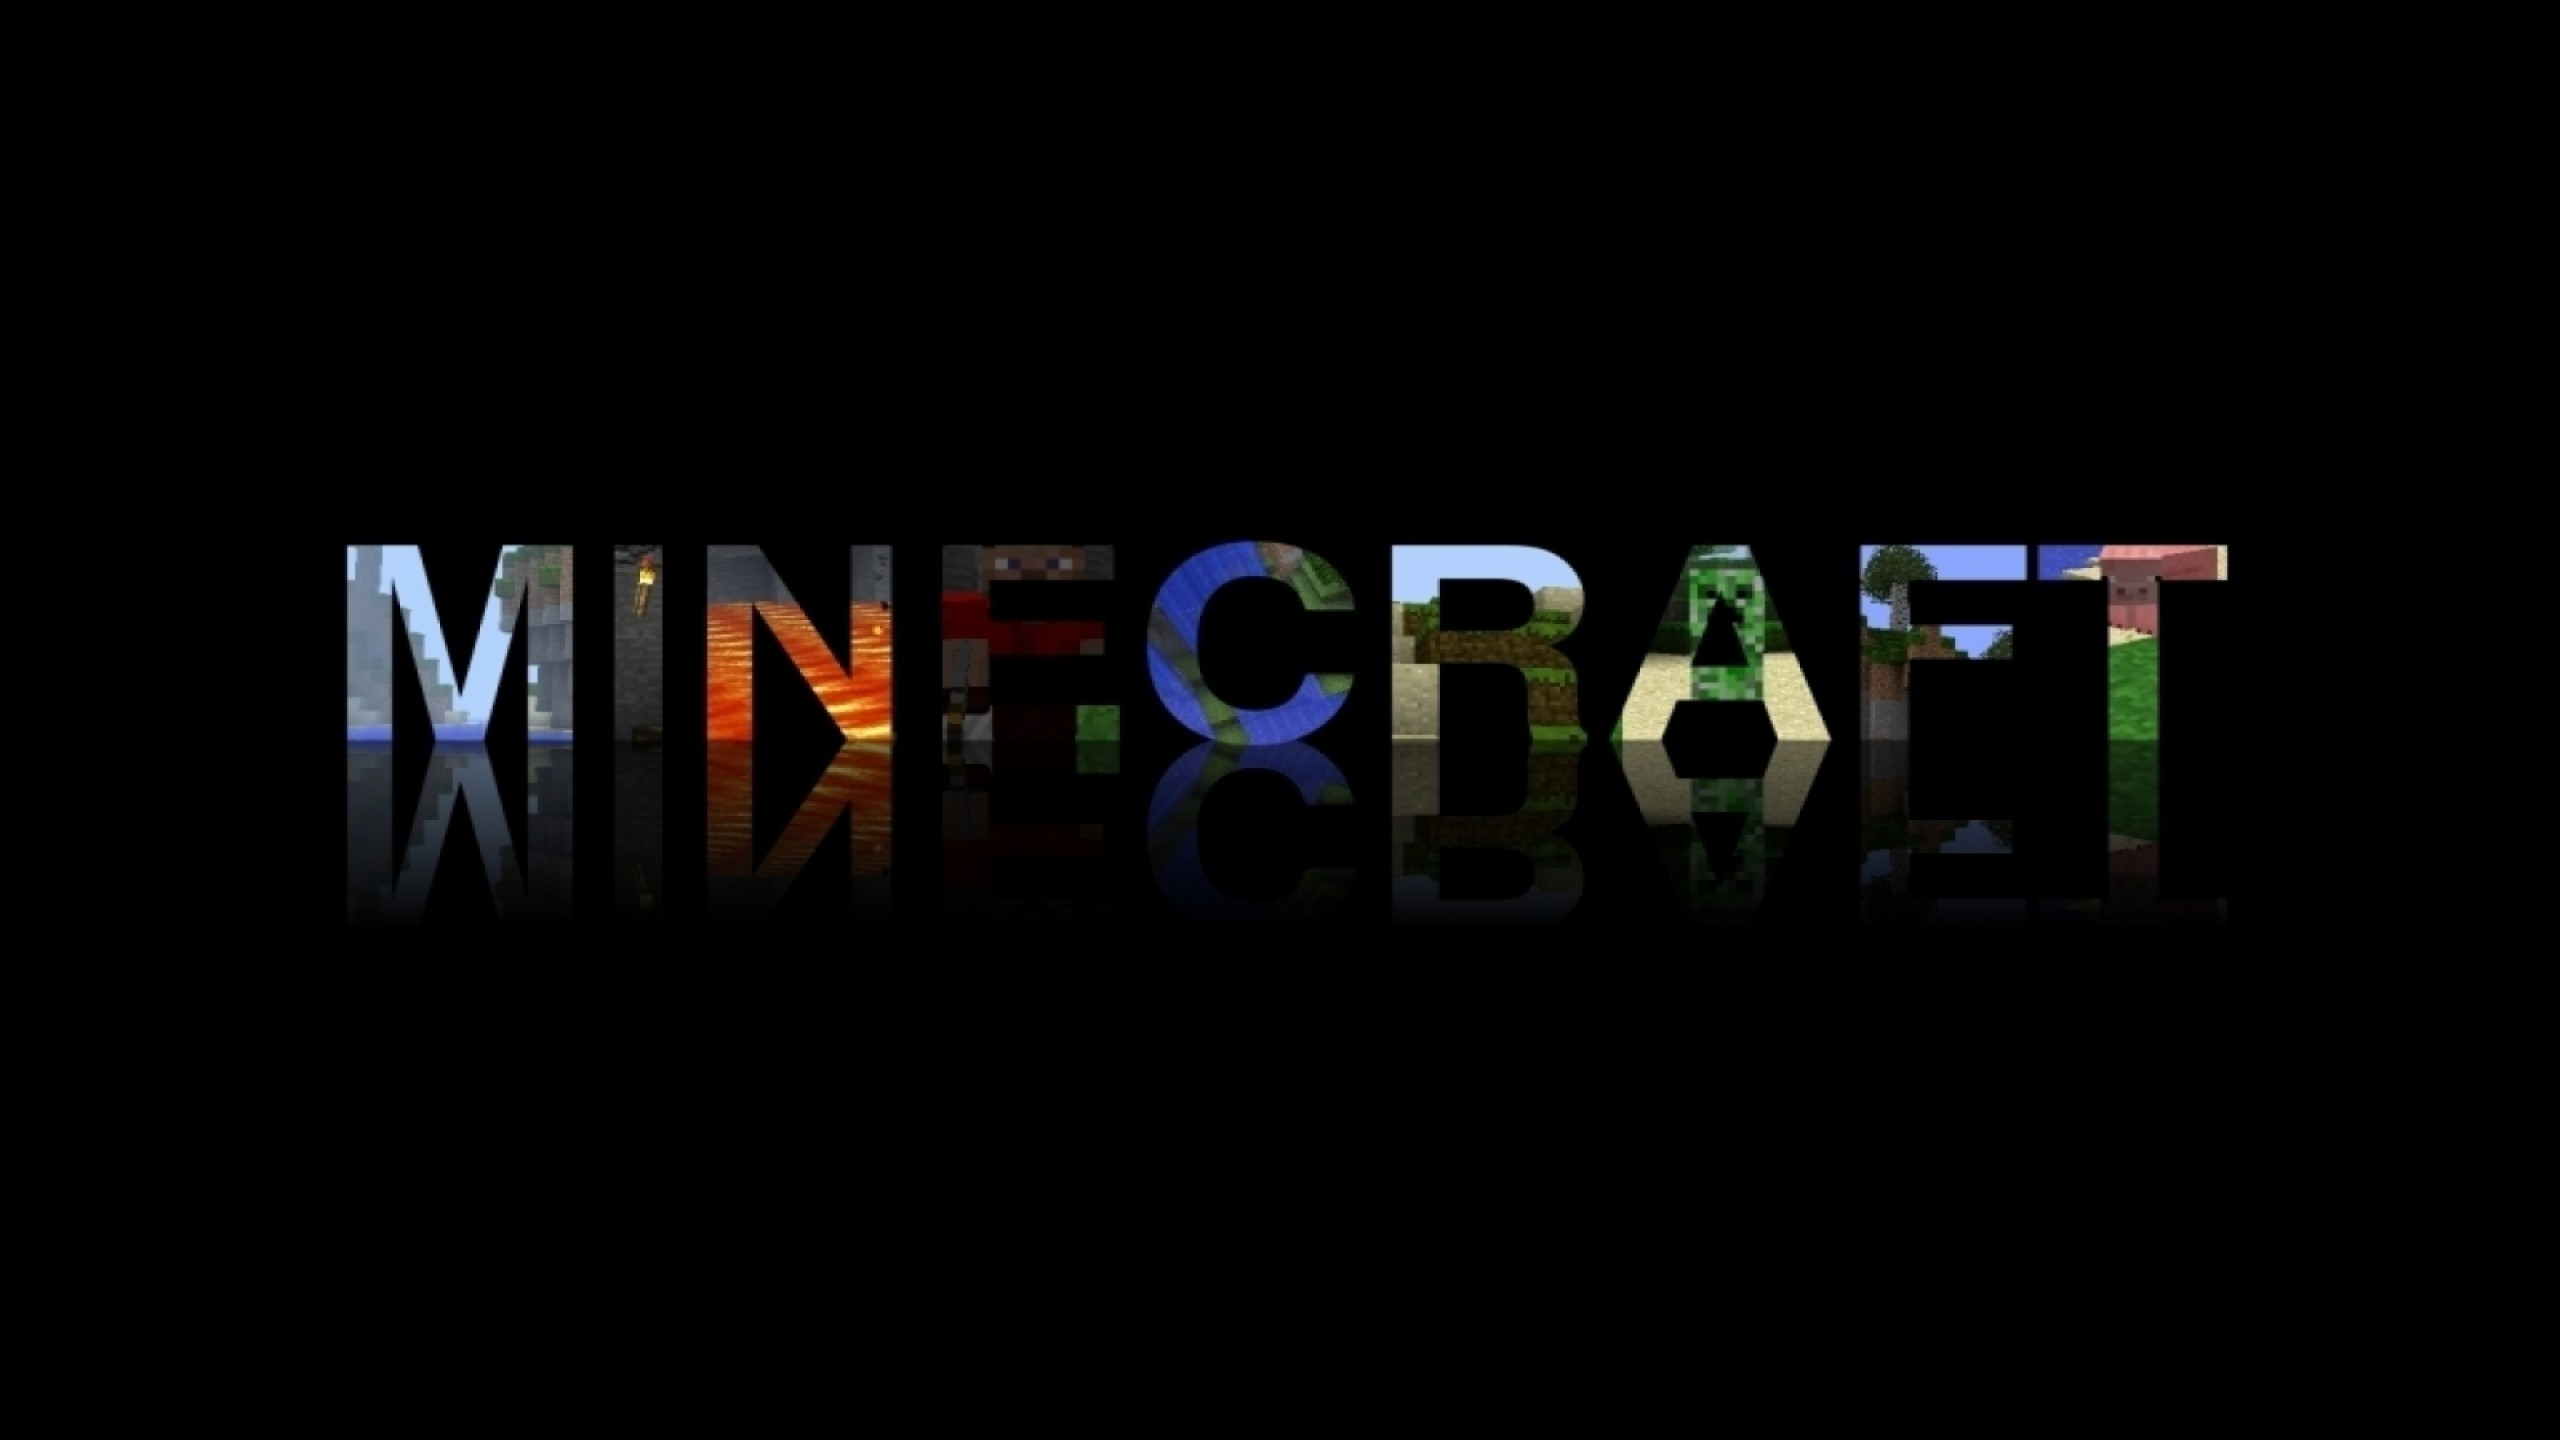 Description: Download Video games typography minecraft wallpaper/desktop  background in HD & Widescreen resolution.